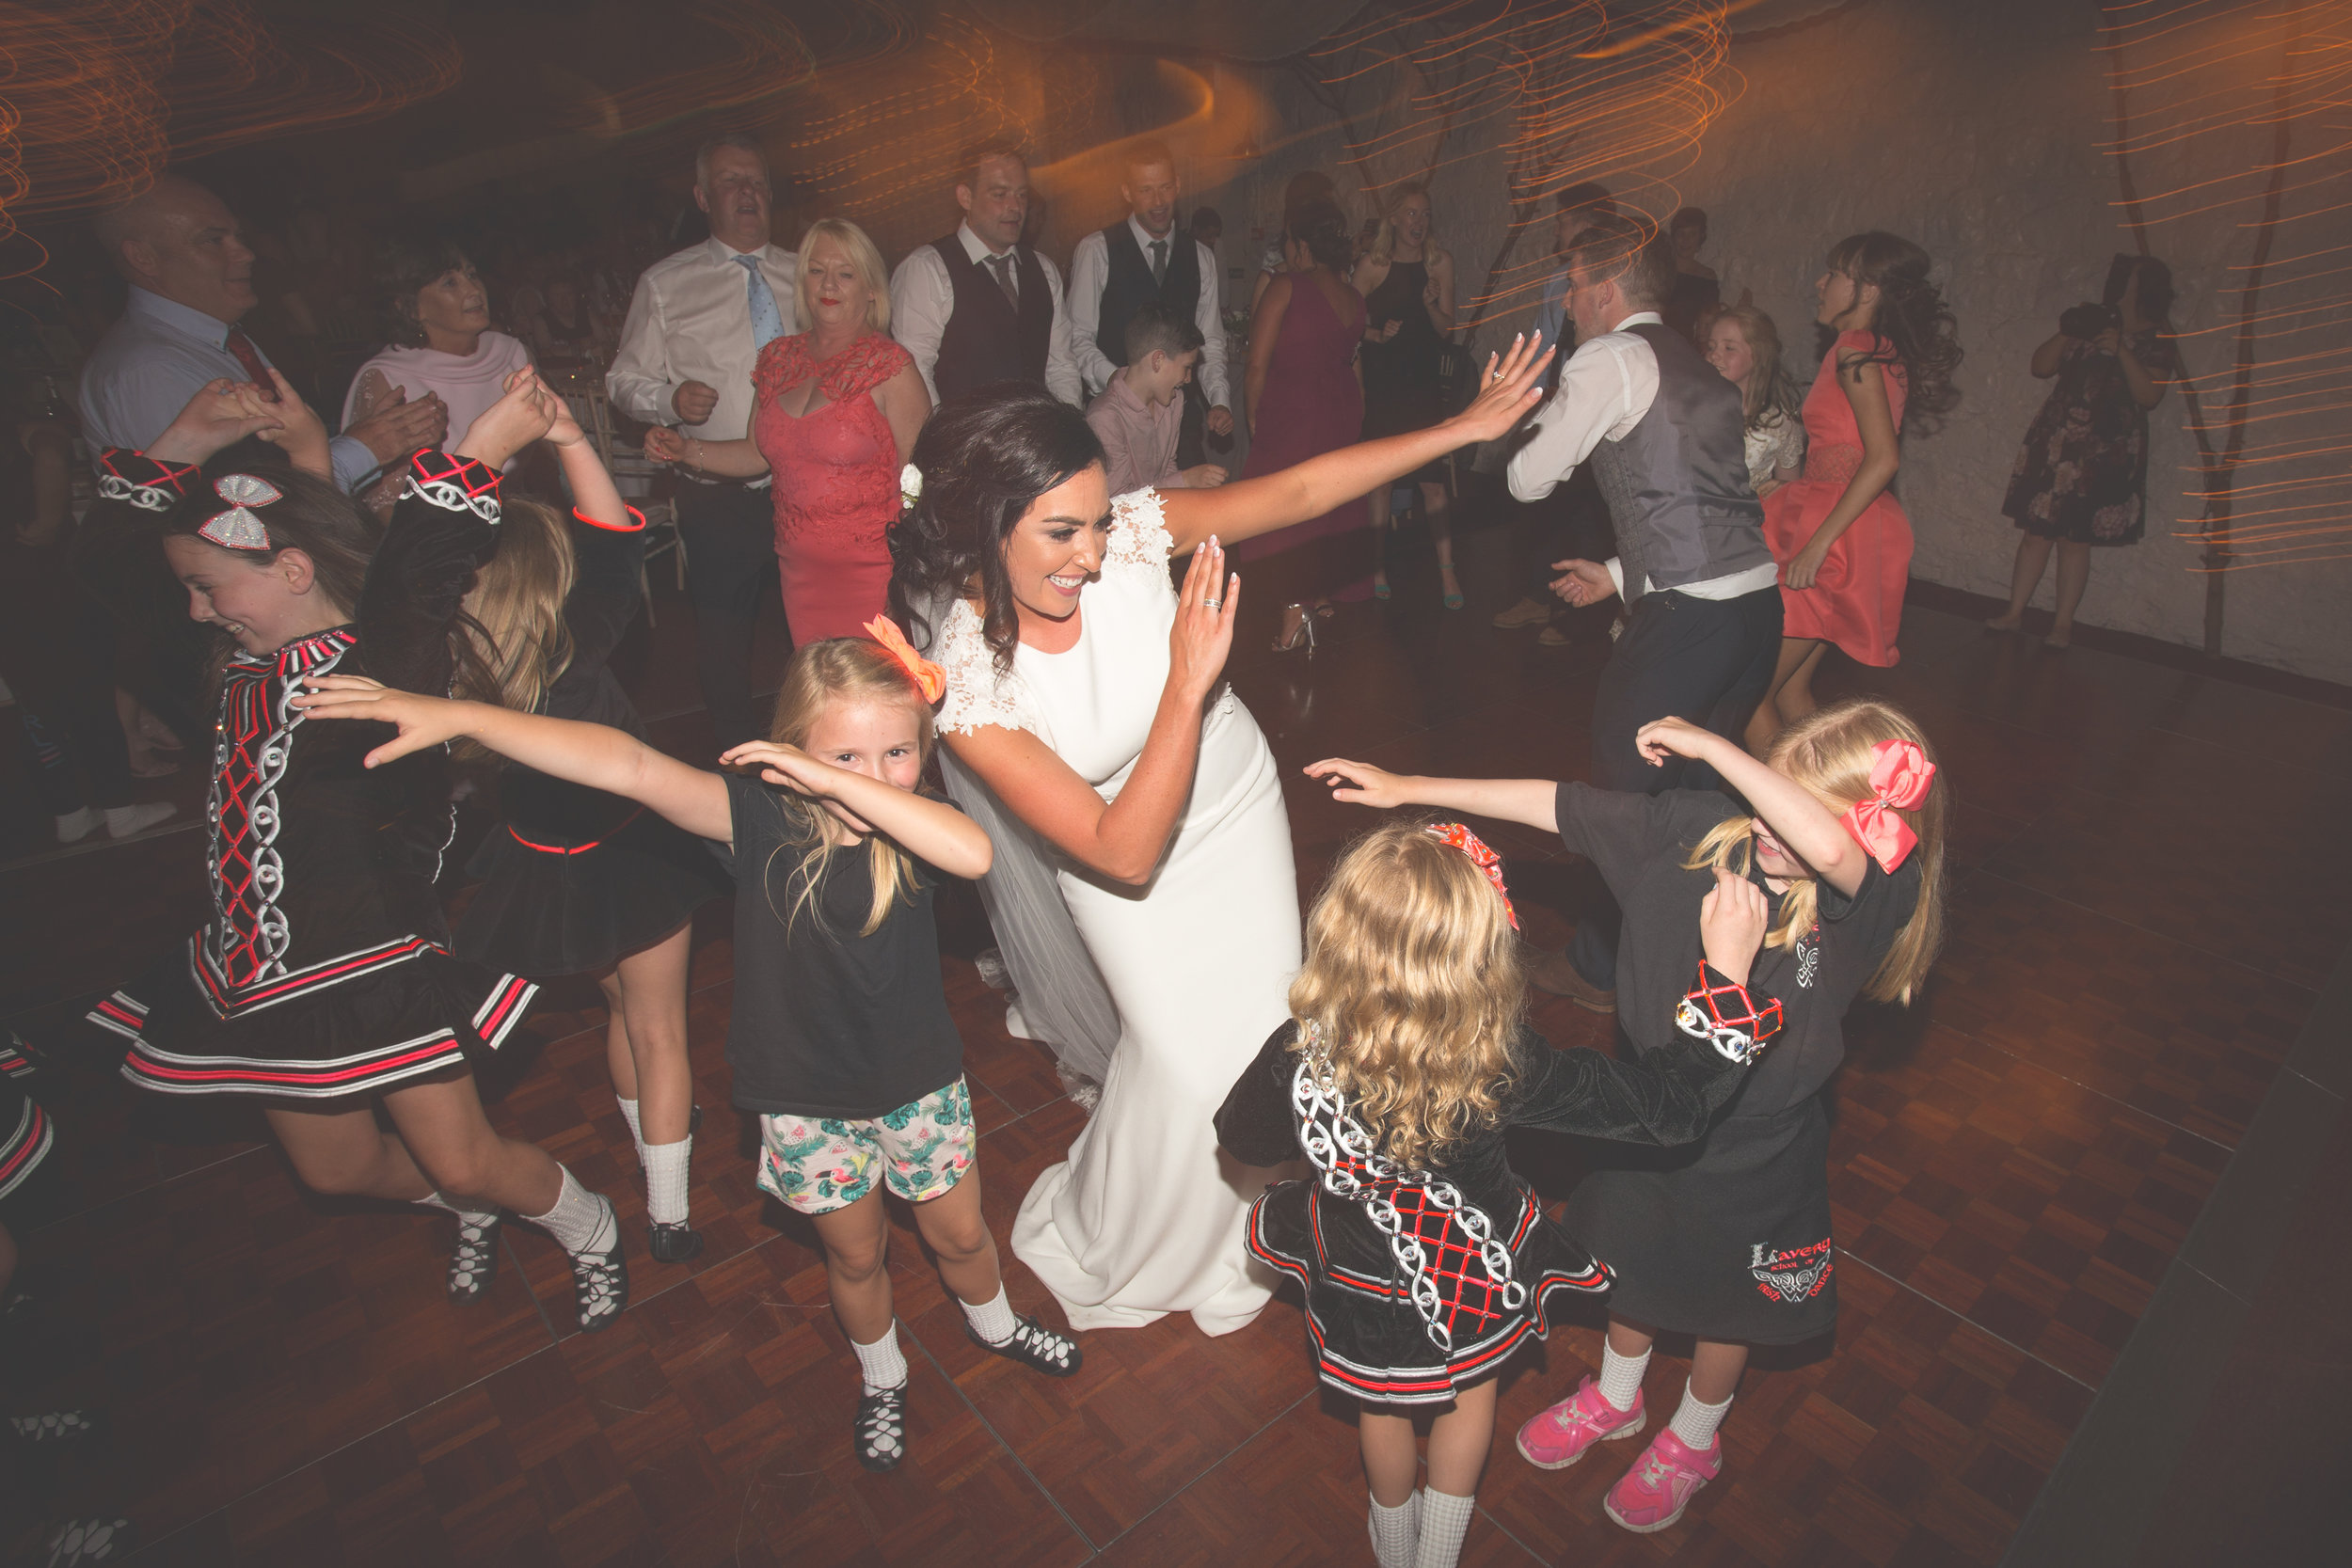 Brian McEwan Wedding Photography | Carol-Annee & Sean | The Dancing-74.jpg